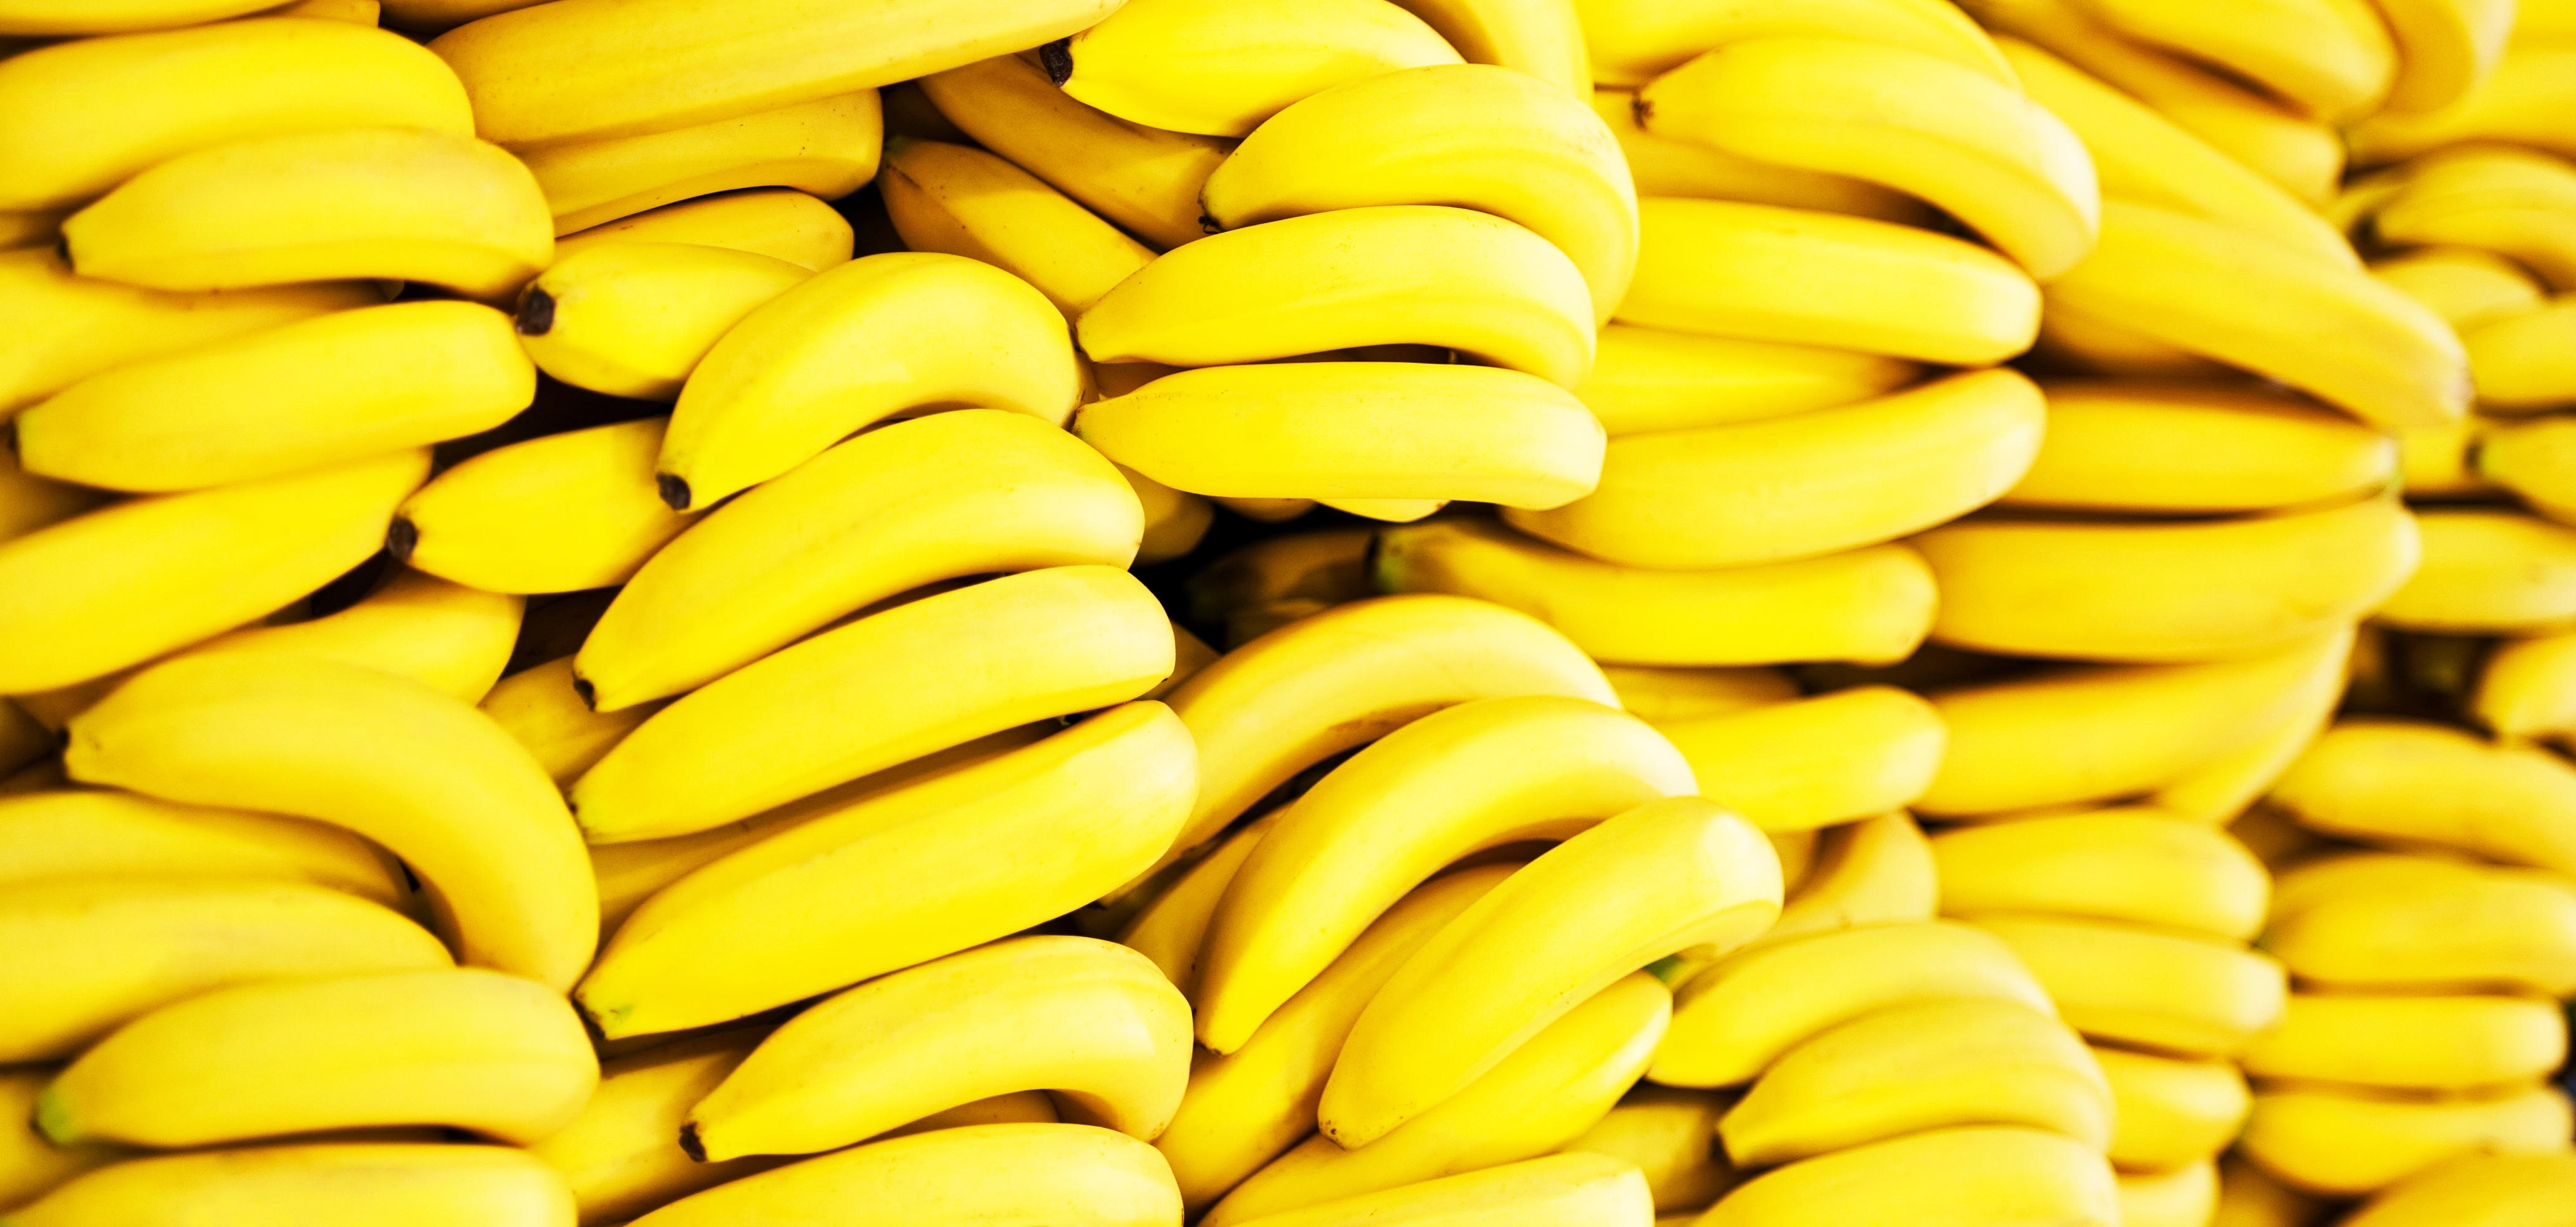 Shenton Bananas Stack